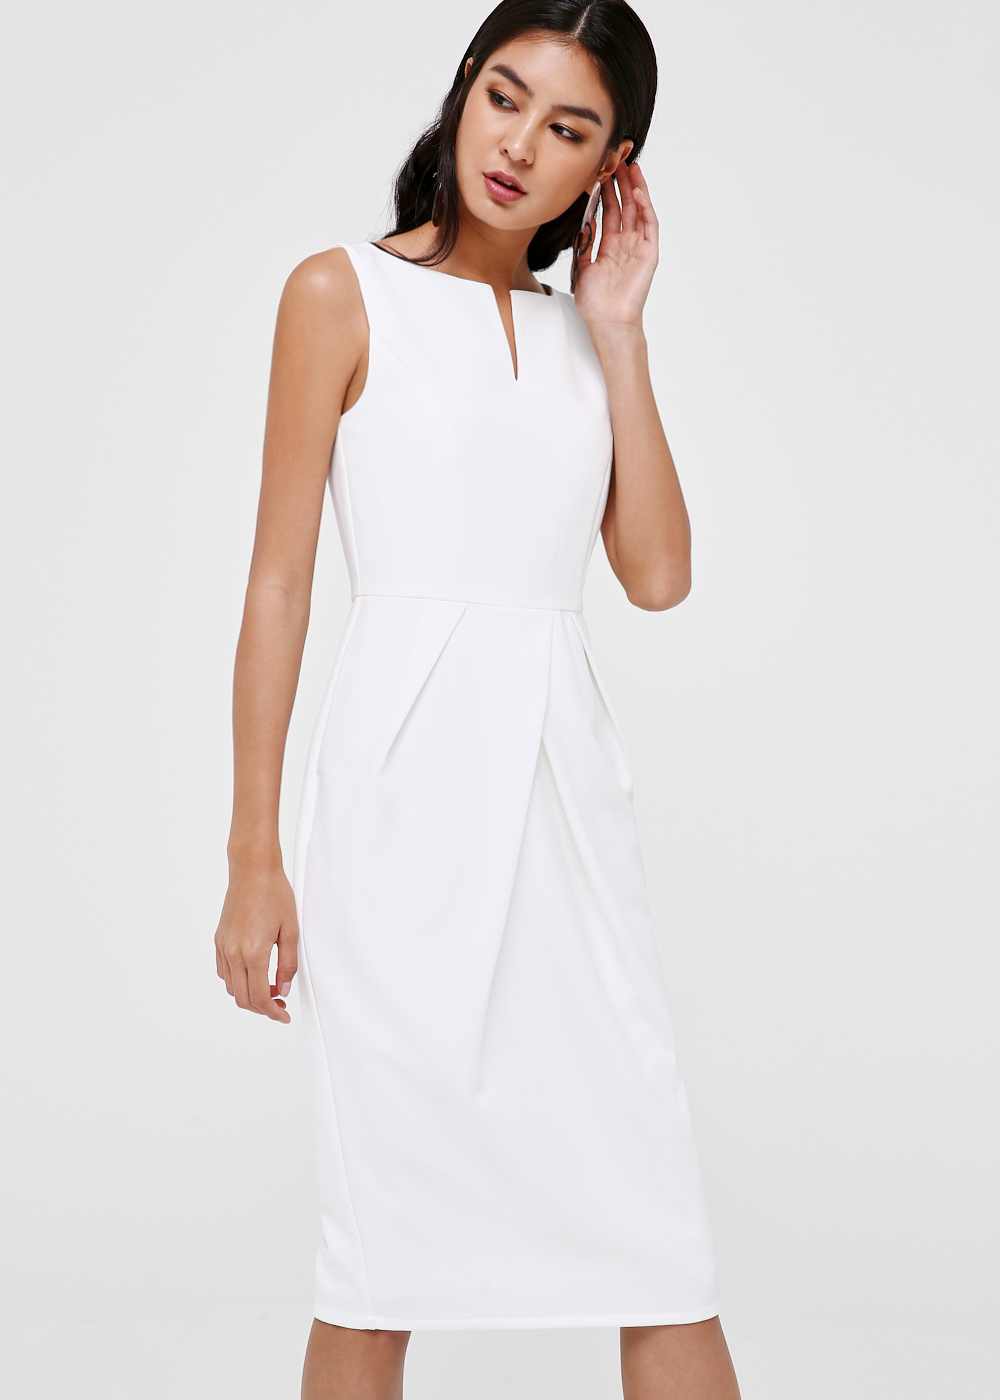 d22c53fe38 Shop Dresses Online | Love, Bonito Singapore | Women's Fashion